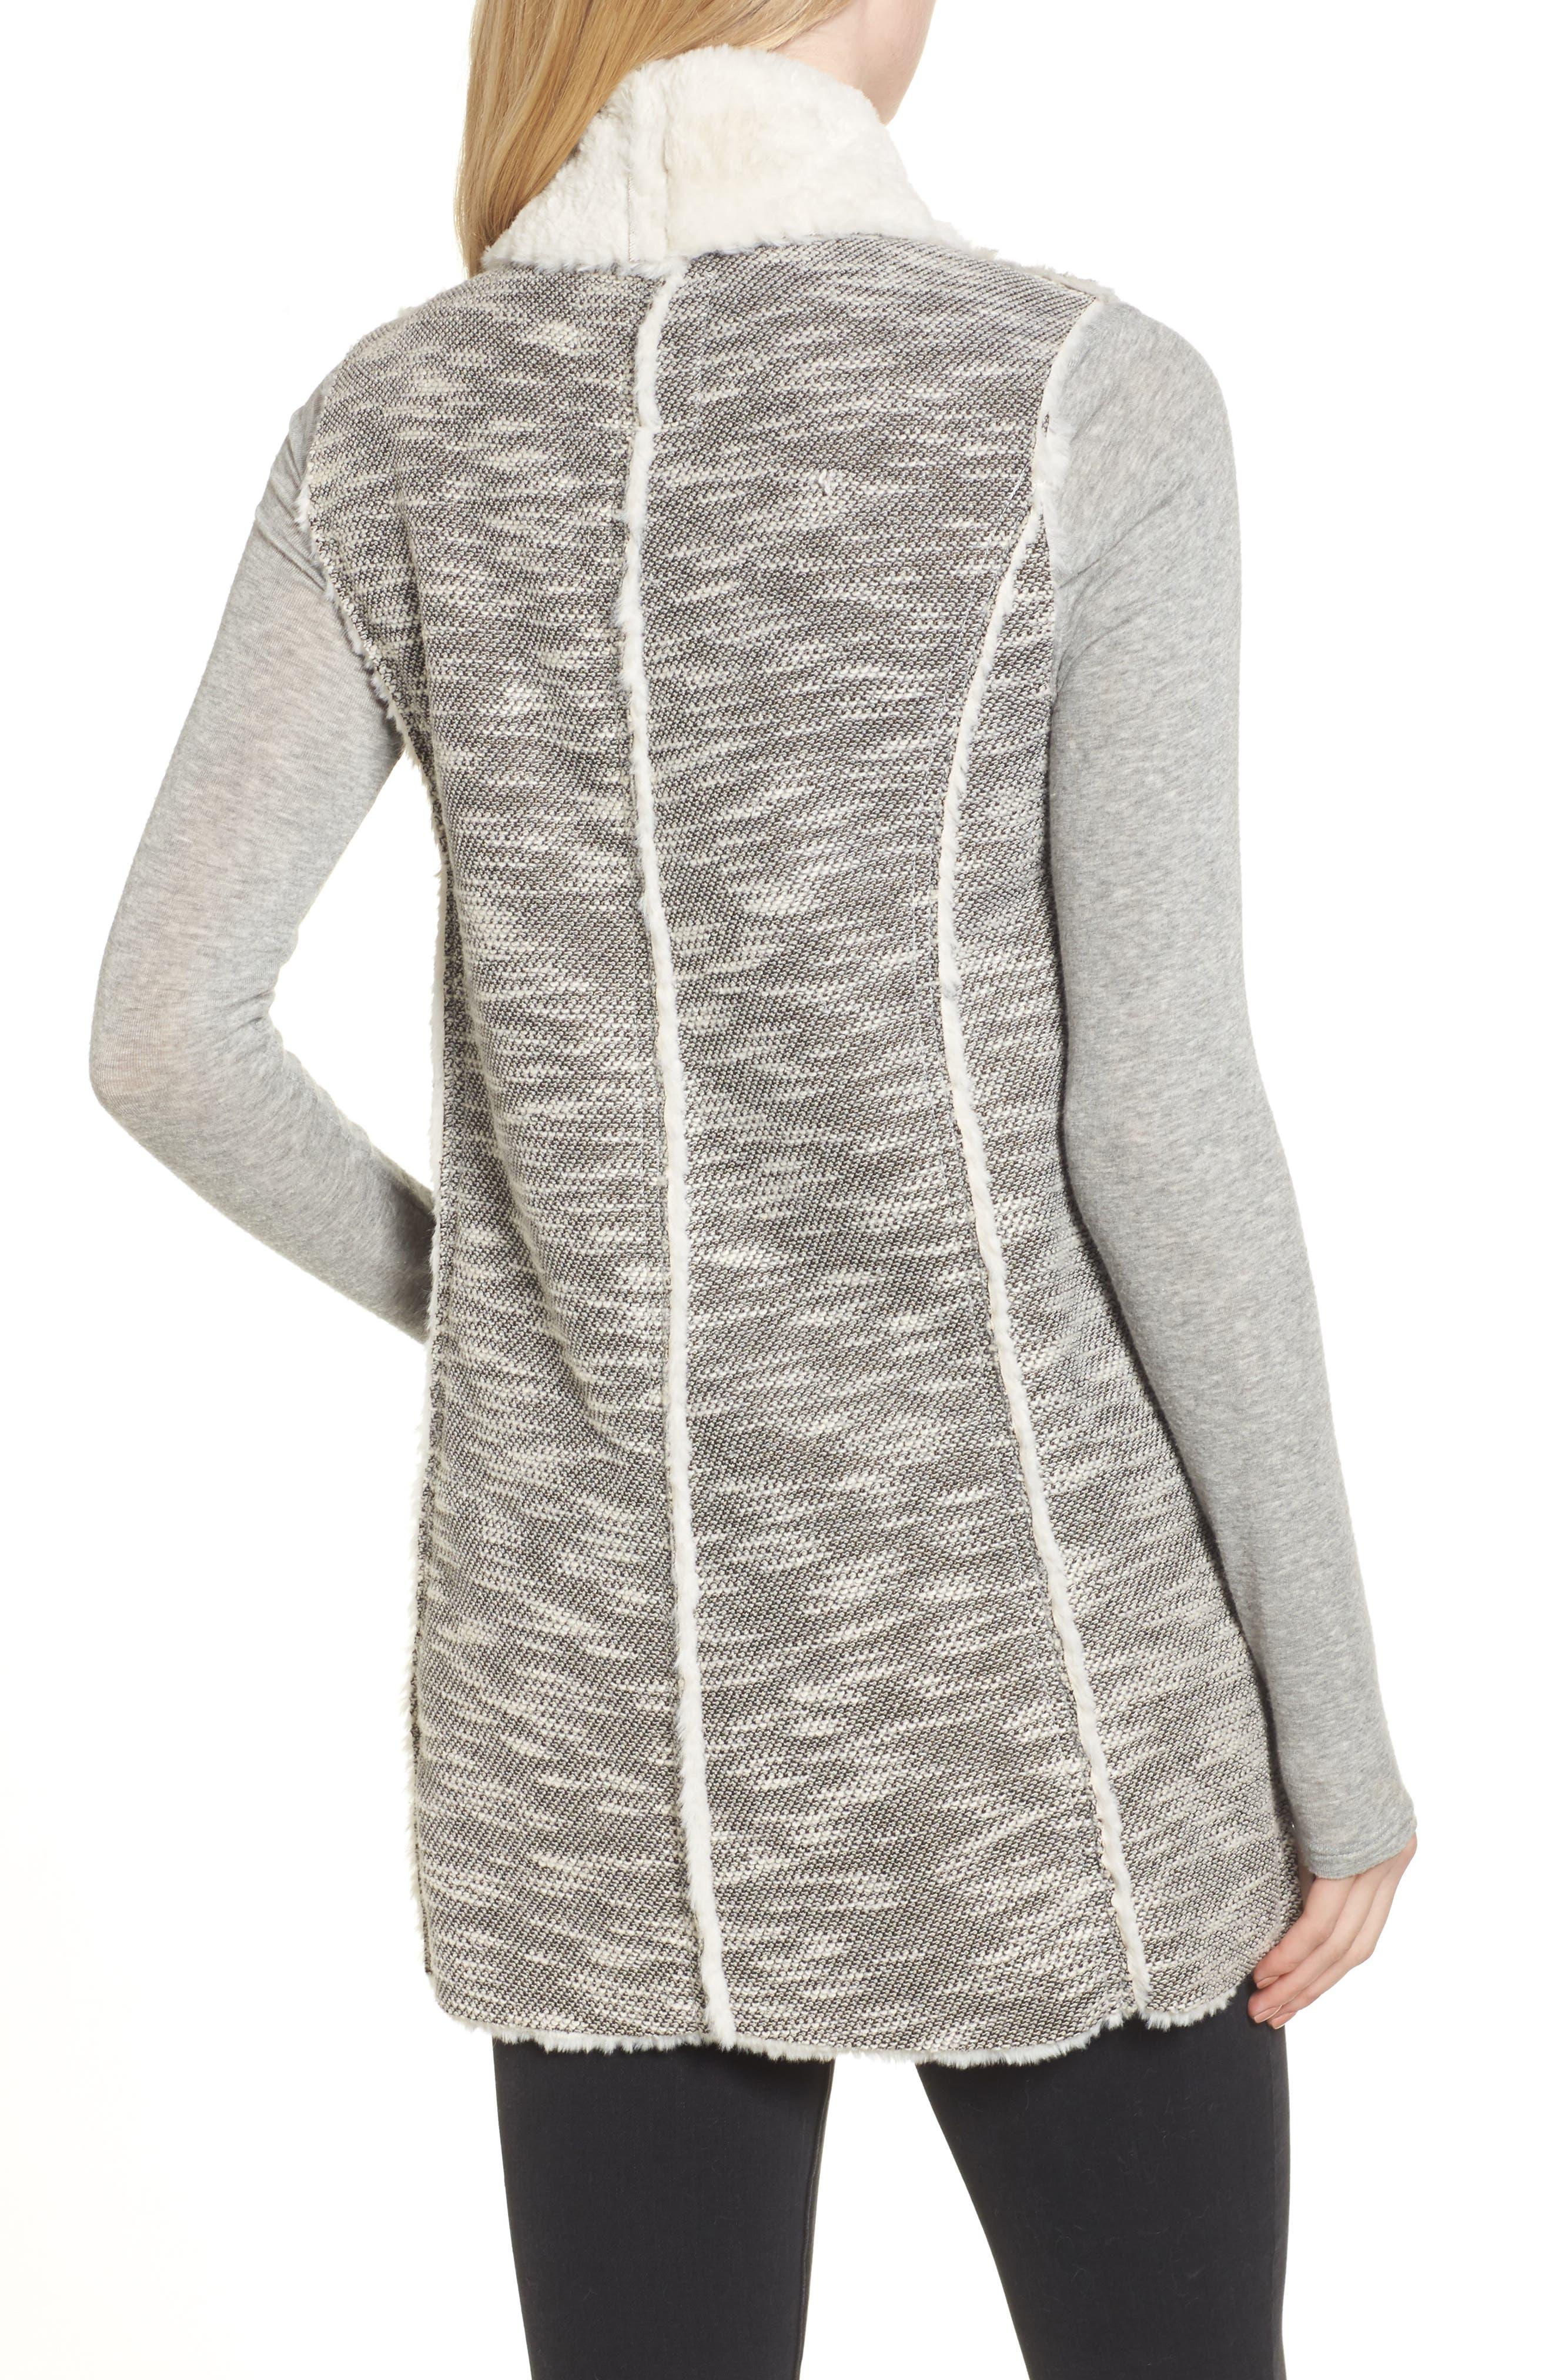 Faux Shearling Vest,                             Alternate thumbnail 2, color,                             Black/ White